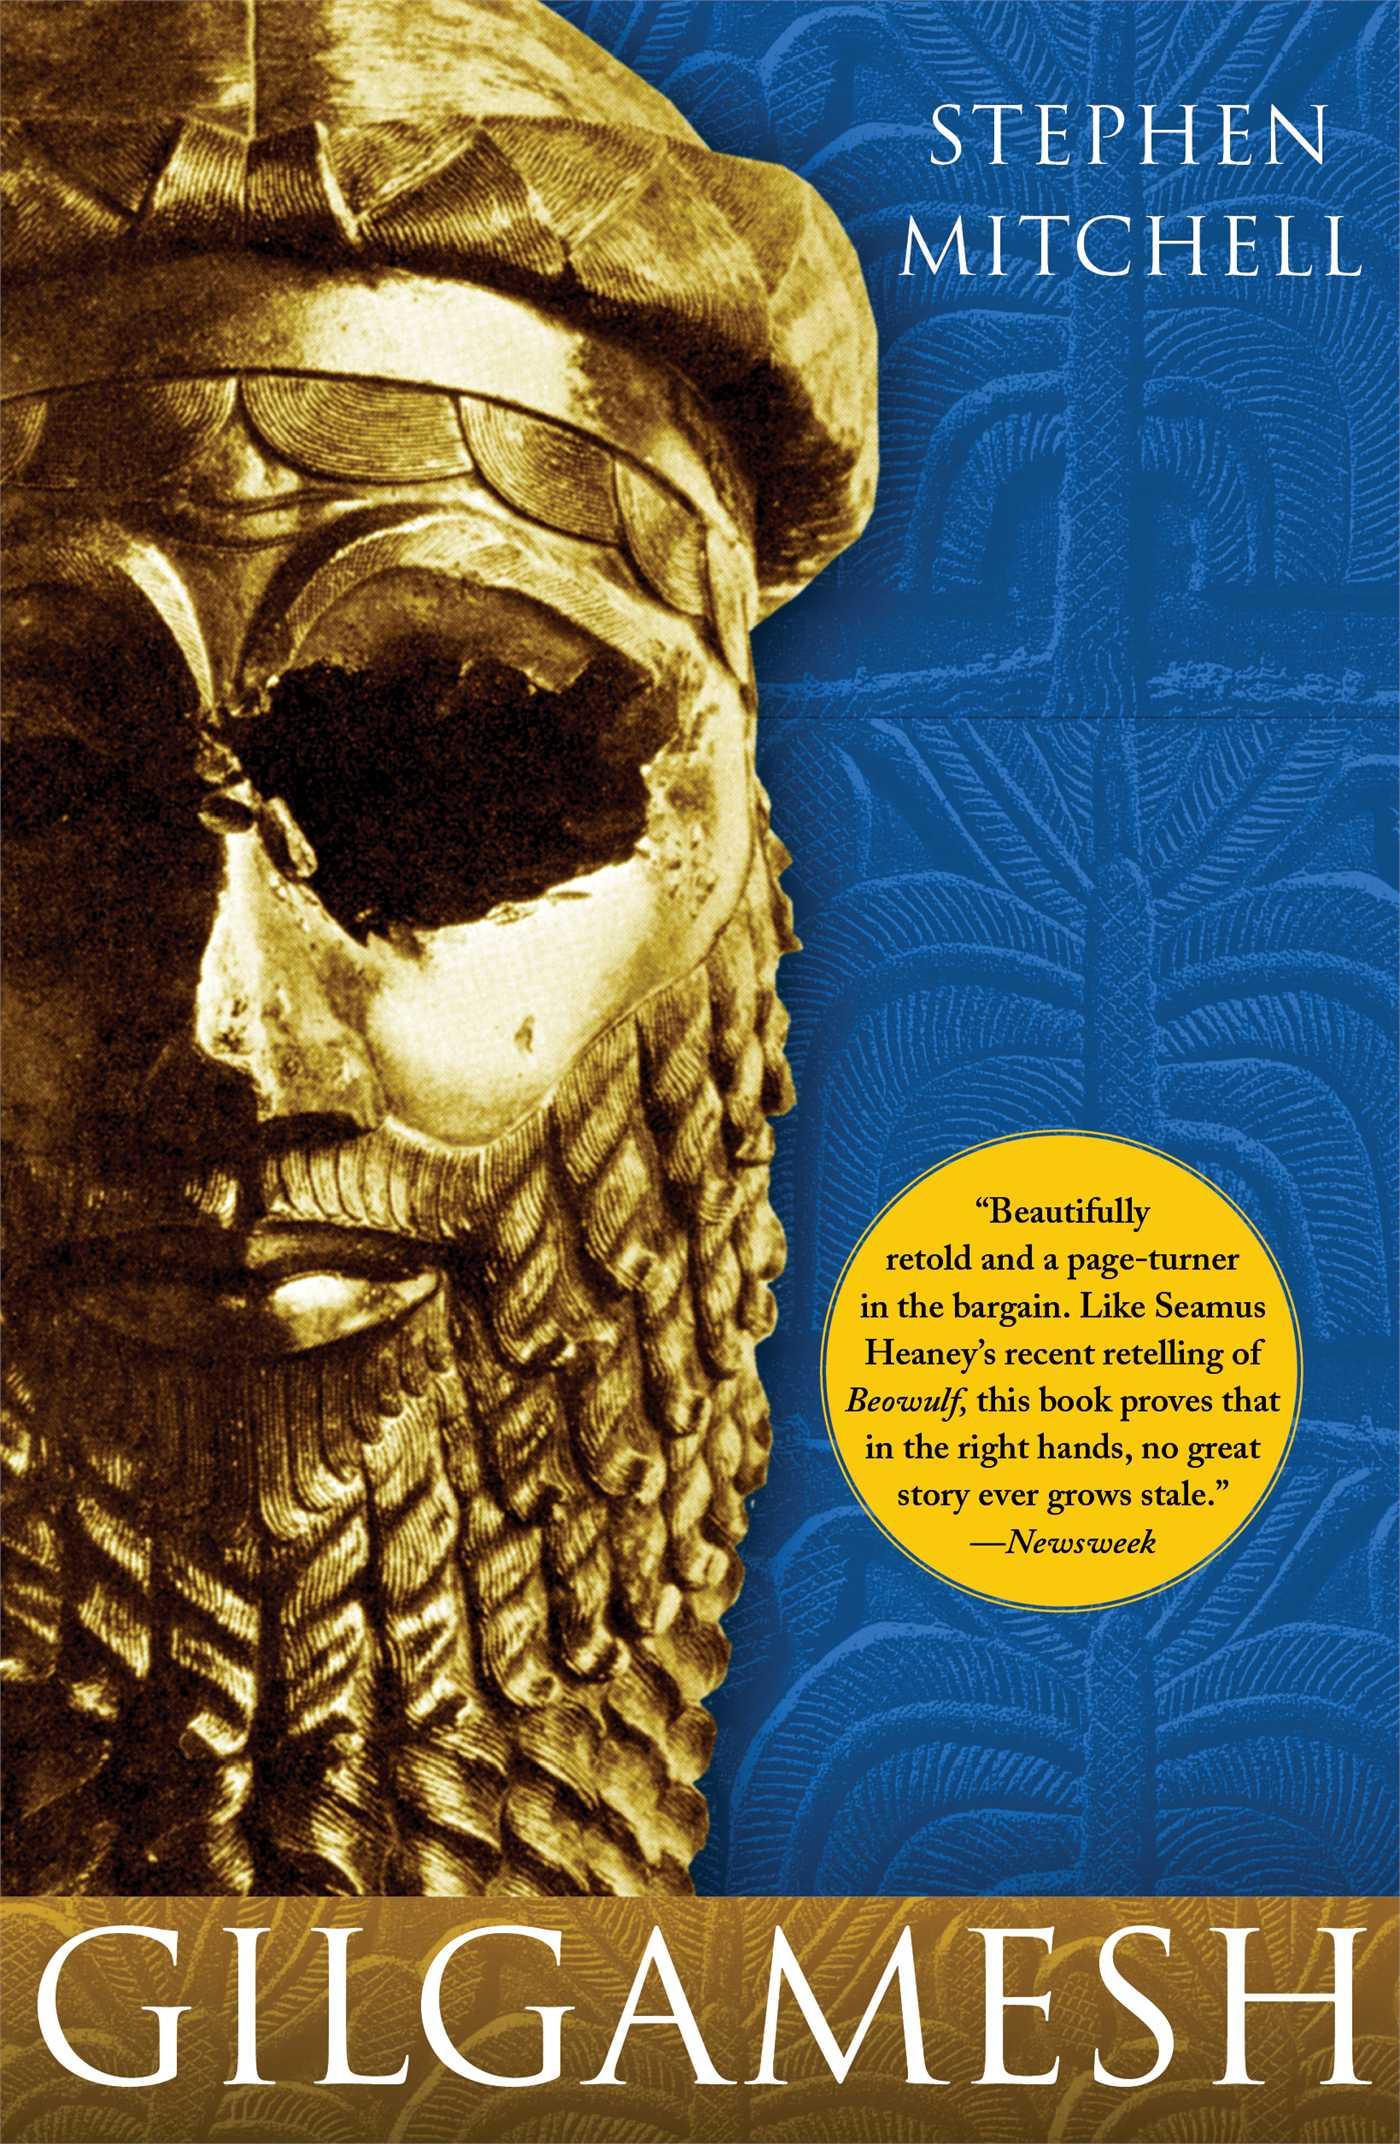 Book Cover Image (jpg): Gilgamesh